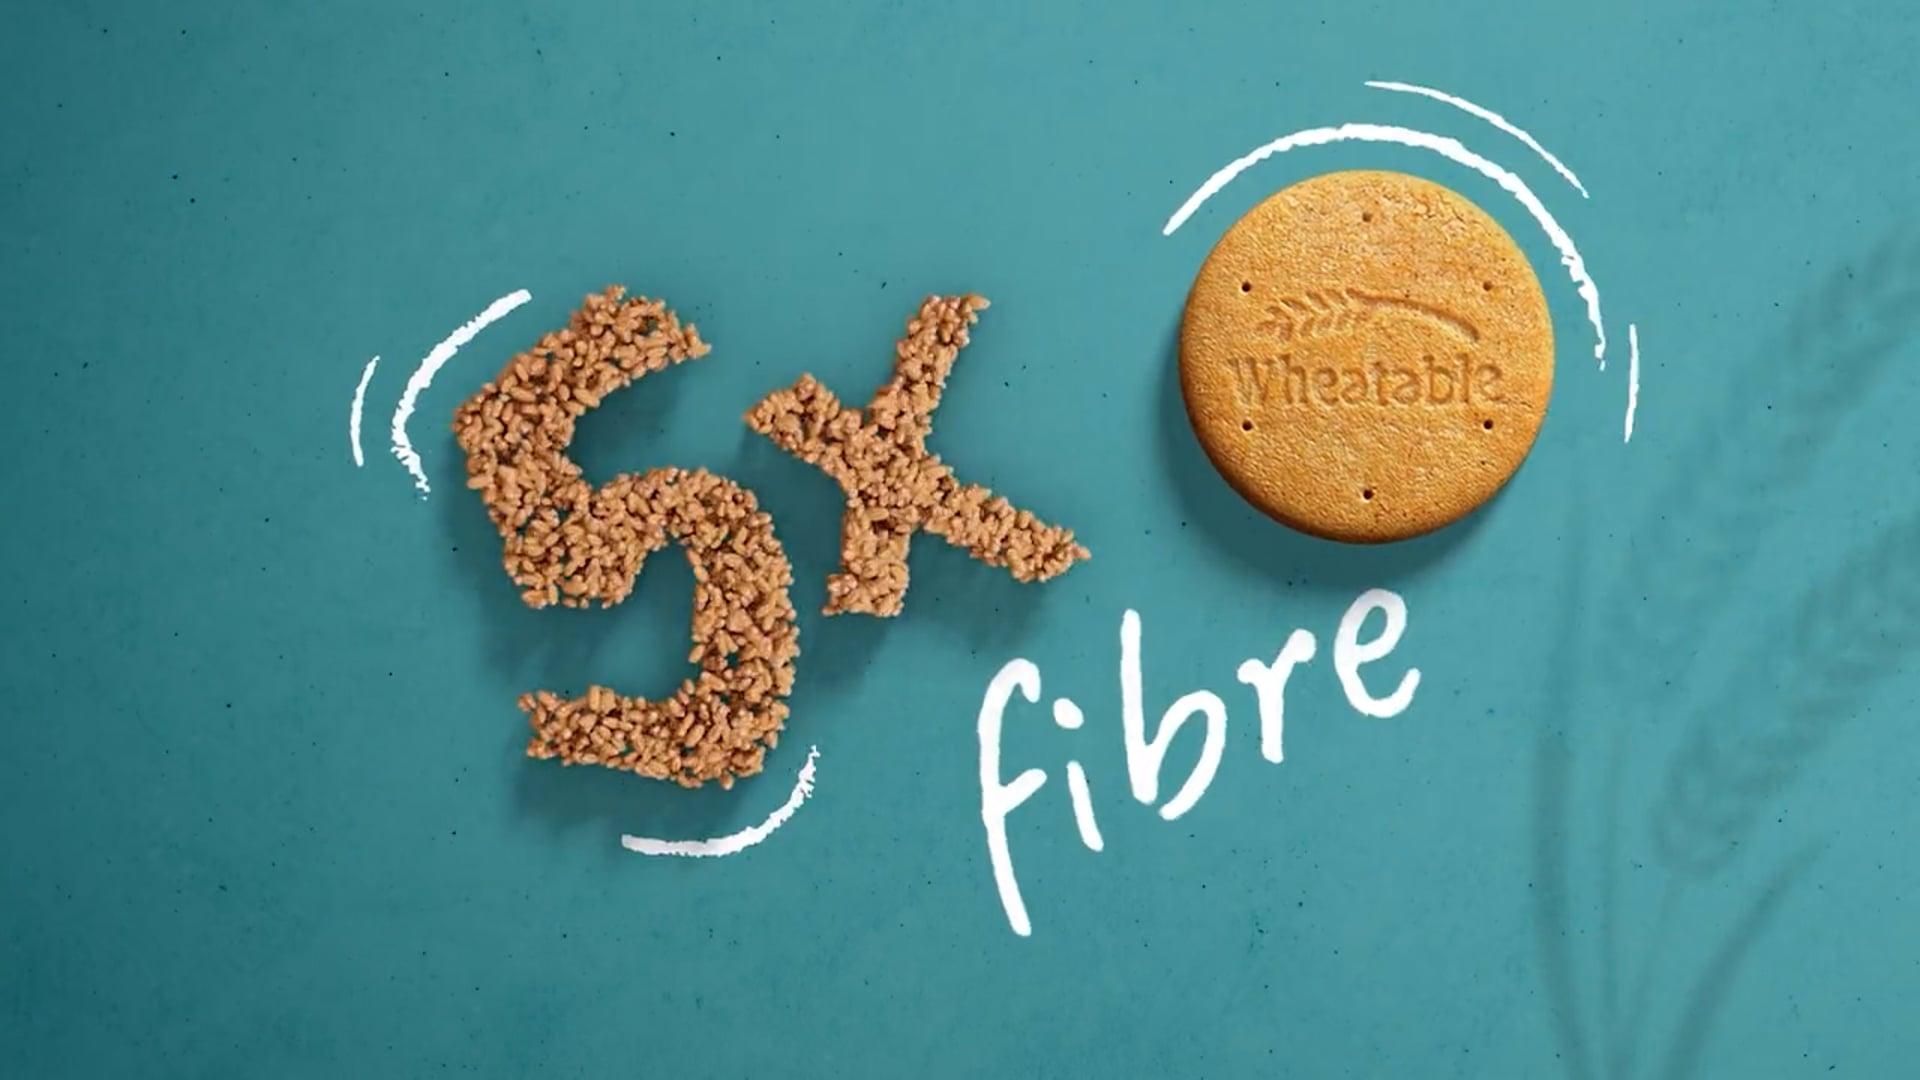 Wheatables 5x Fibre